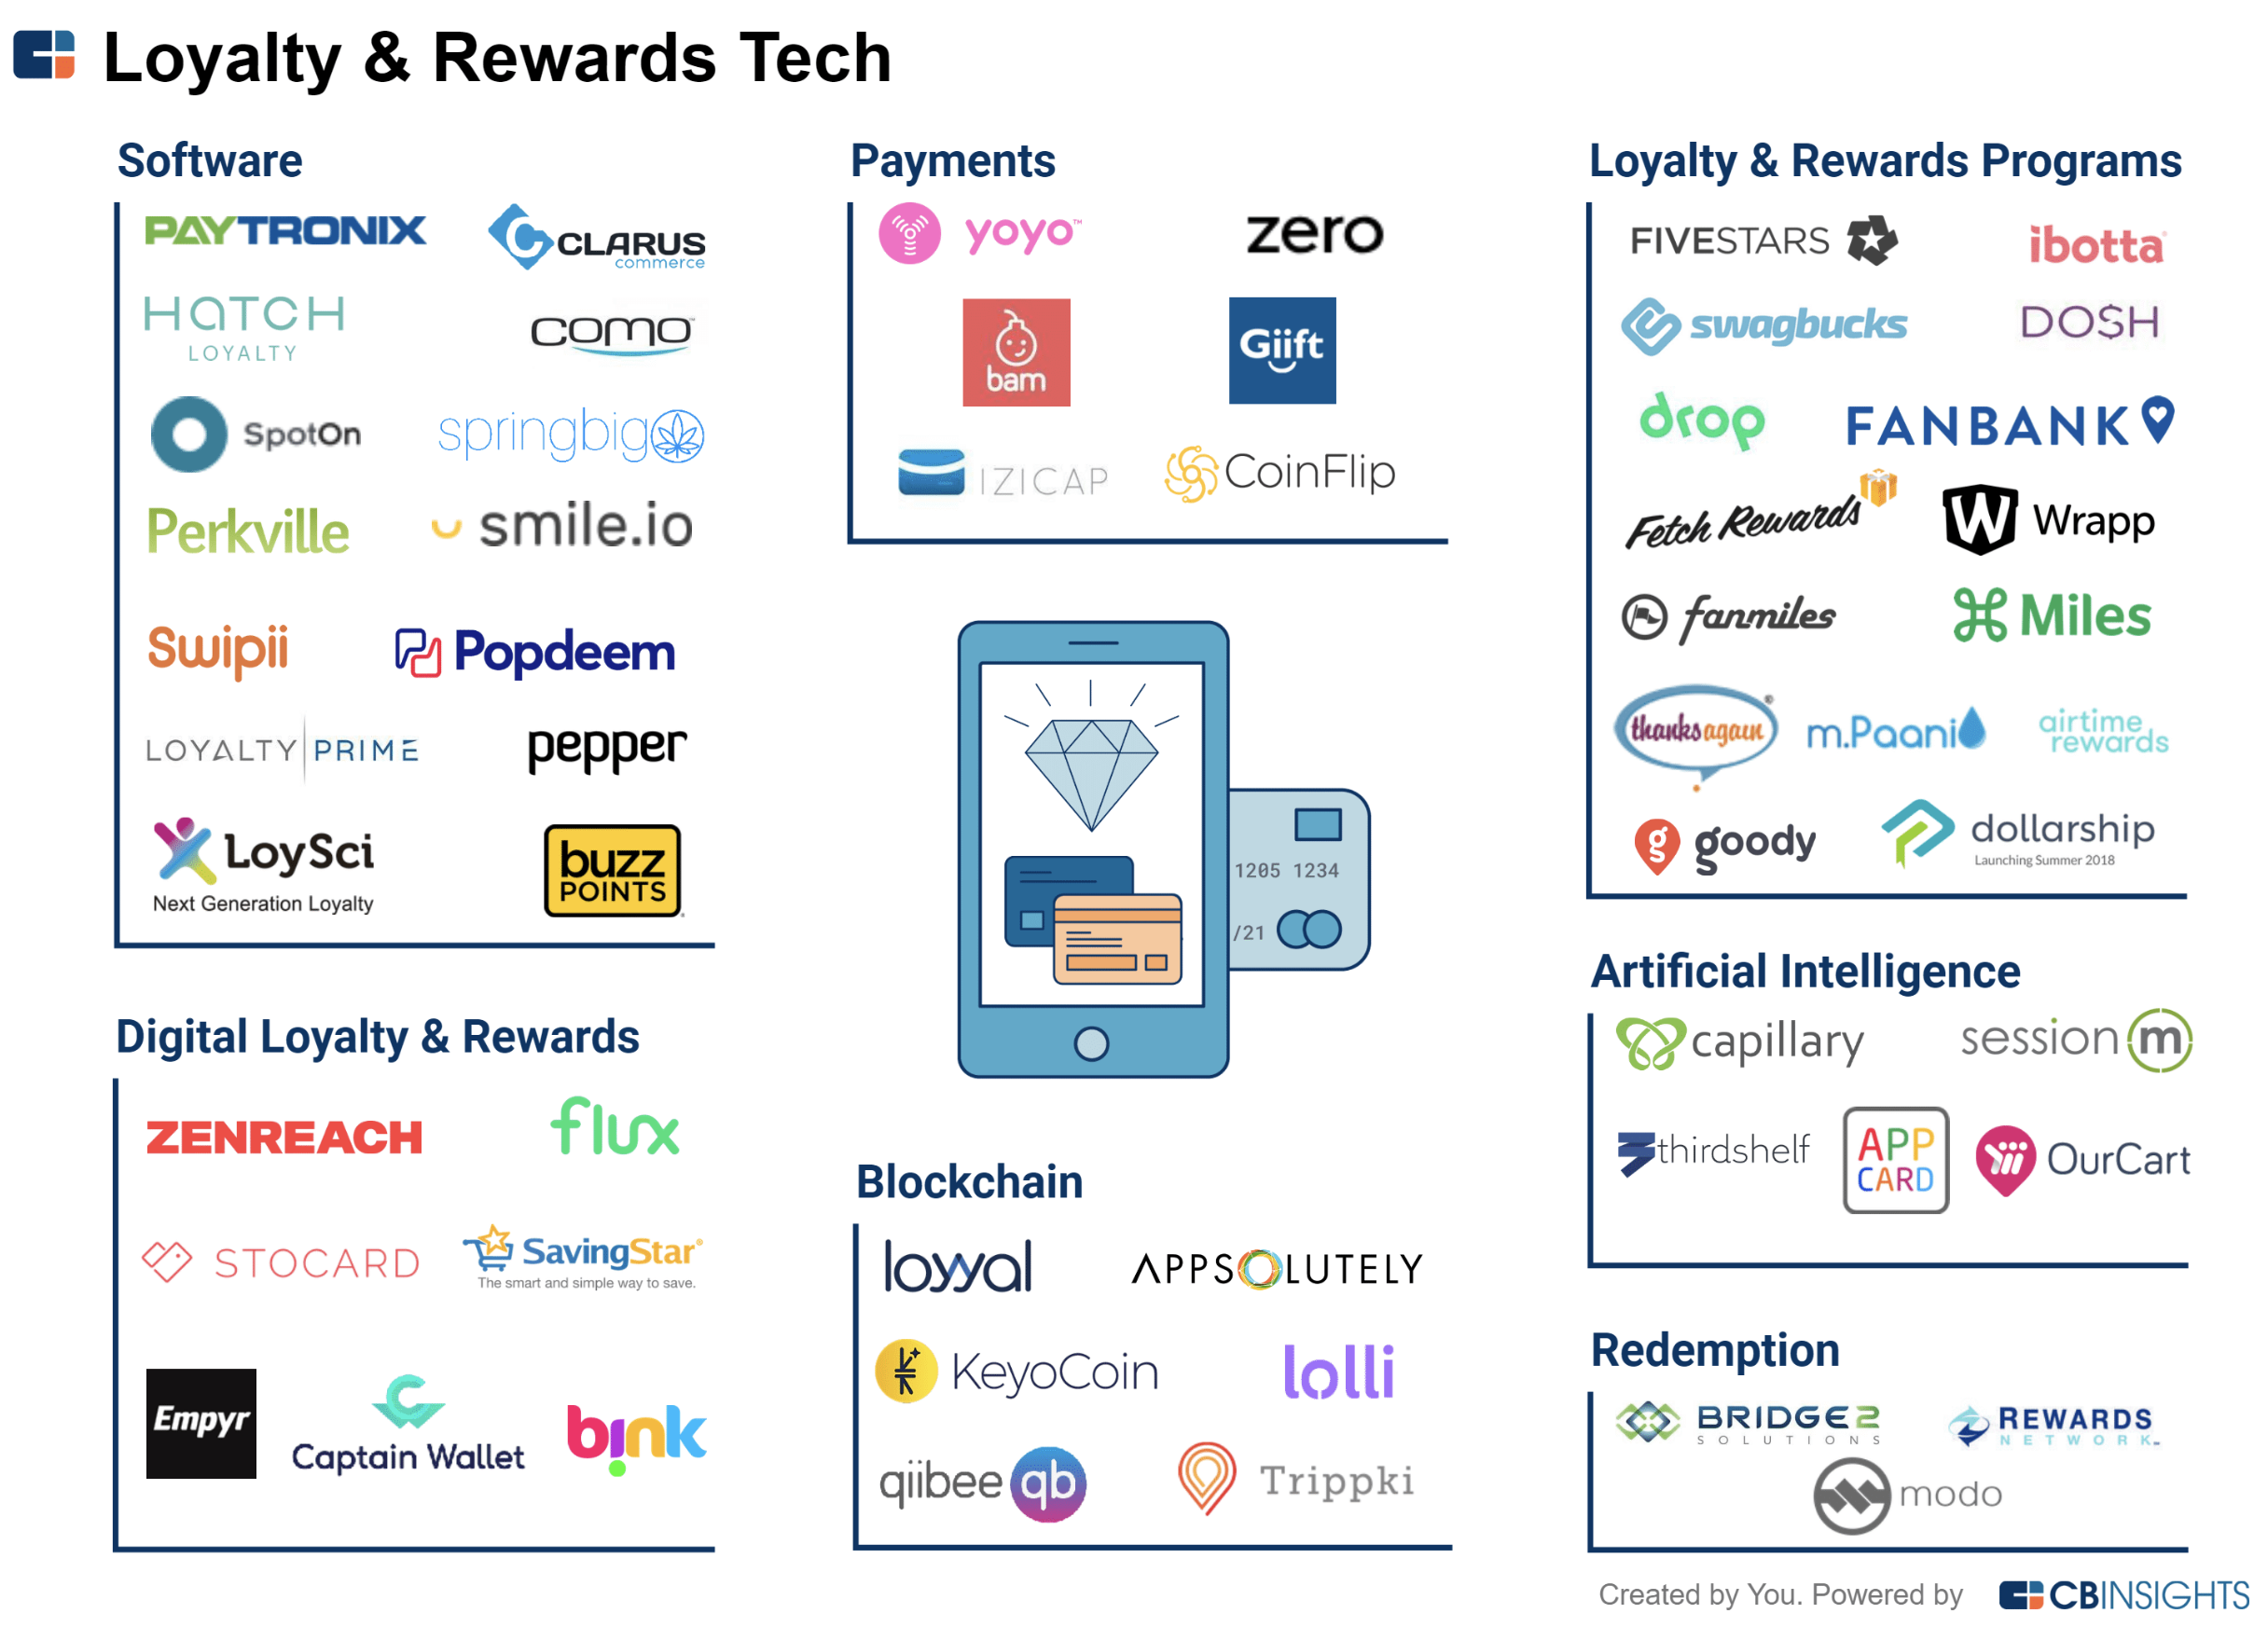 CB Insights - Loyalty & Rewards Programs